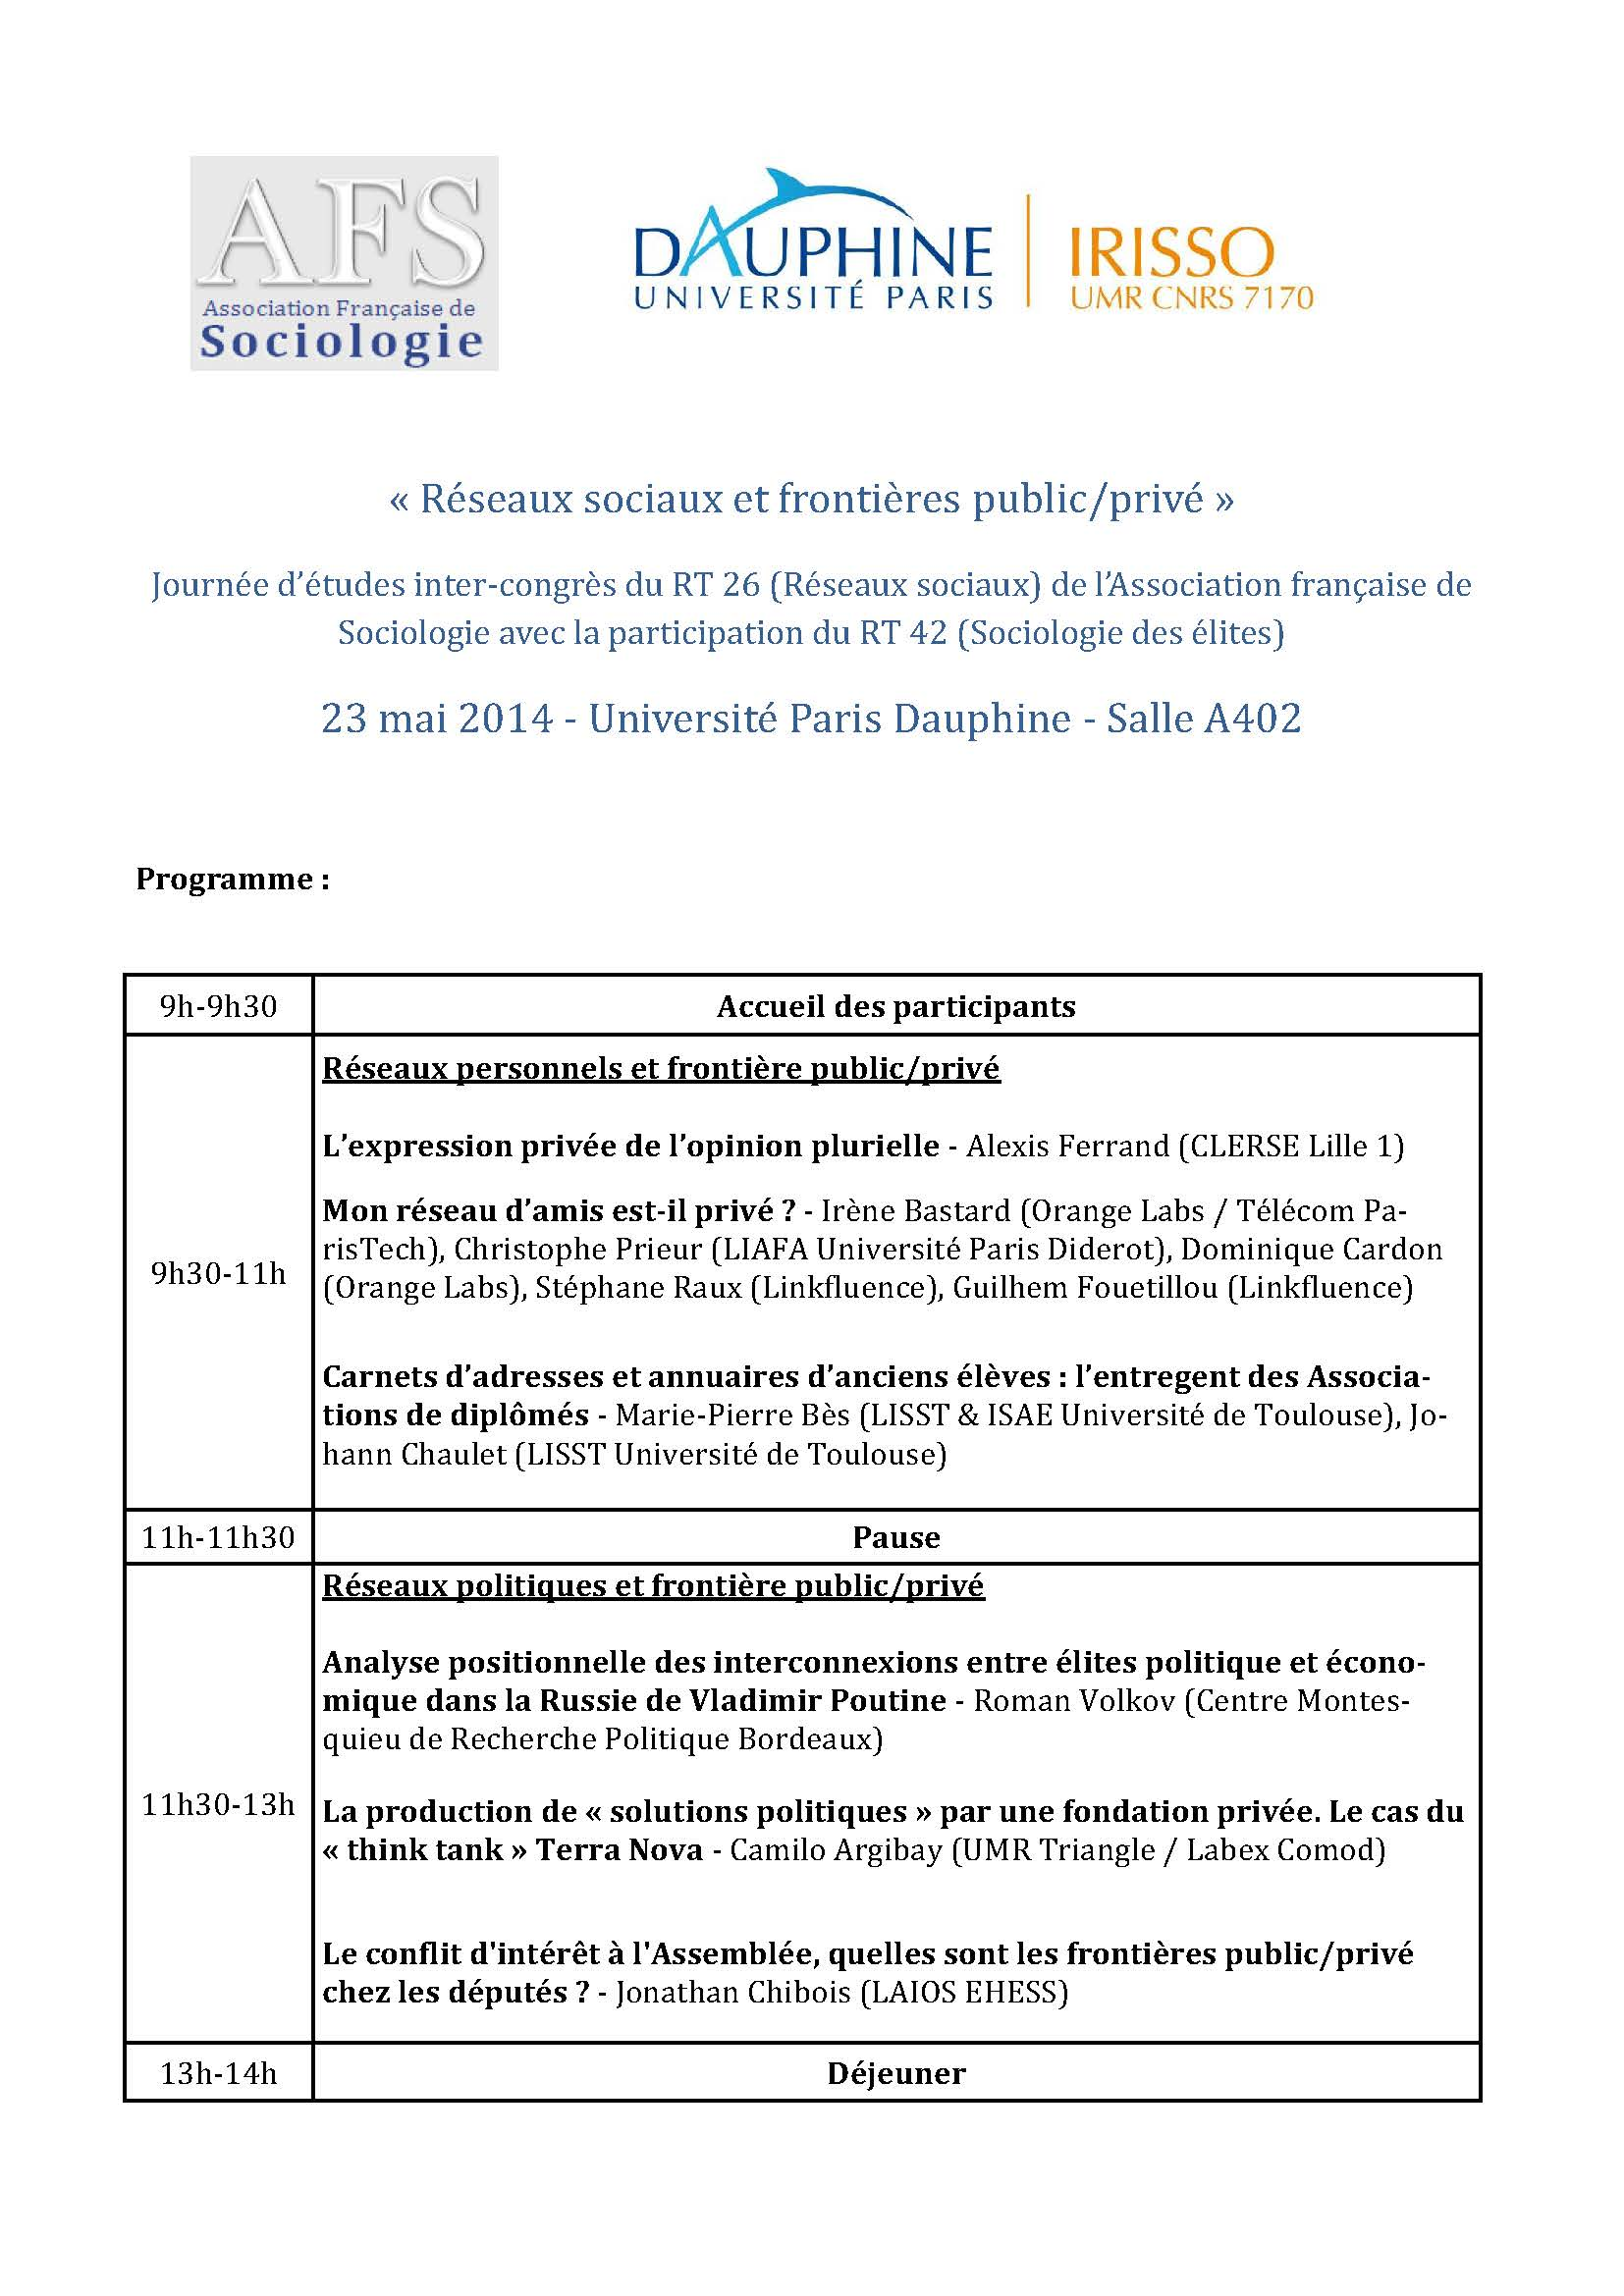 23 mai 2014 Programme_JE_InterCongrès_RT26_Page_1